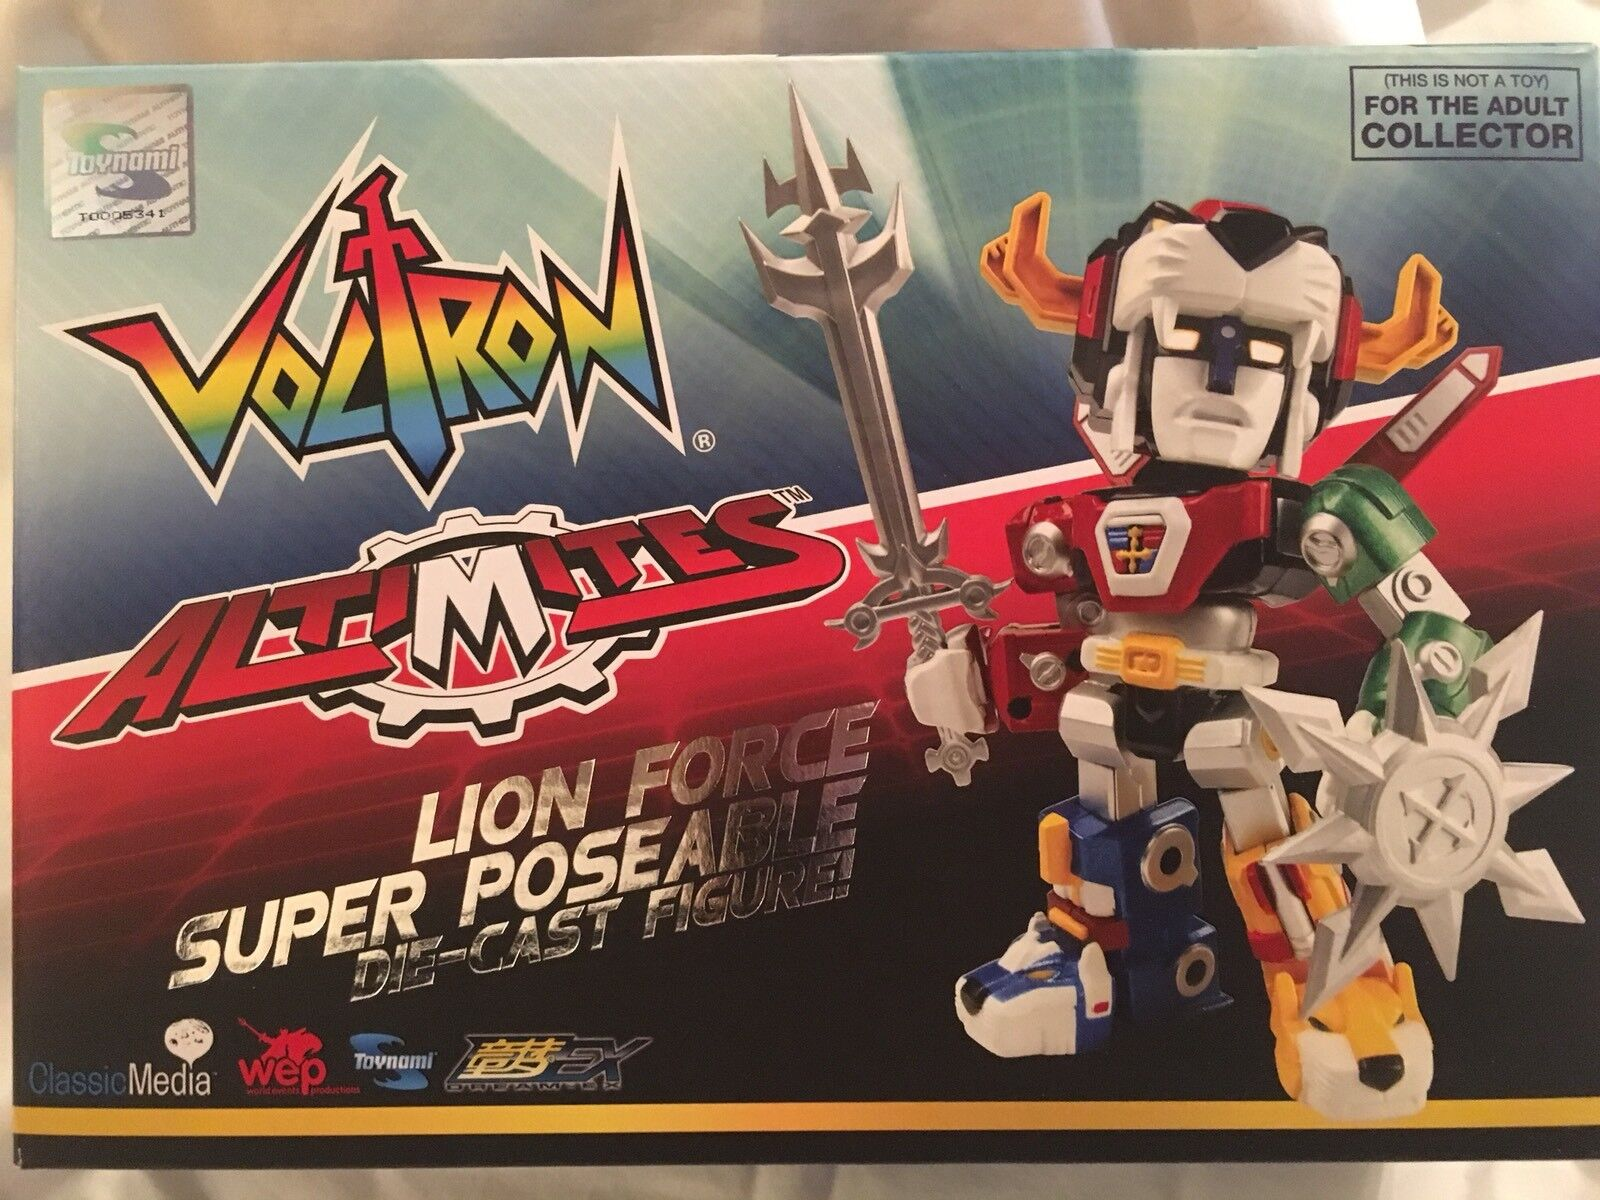 Voltron 30th Anniversary Altimites Lion Force Super Posable Die-Cast by Toynami